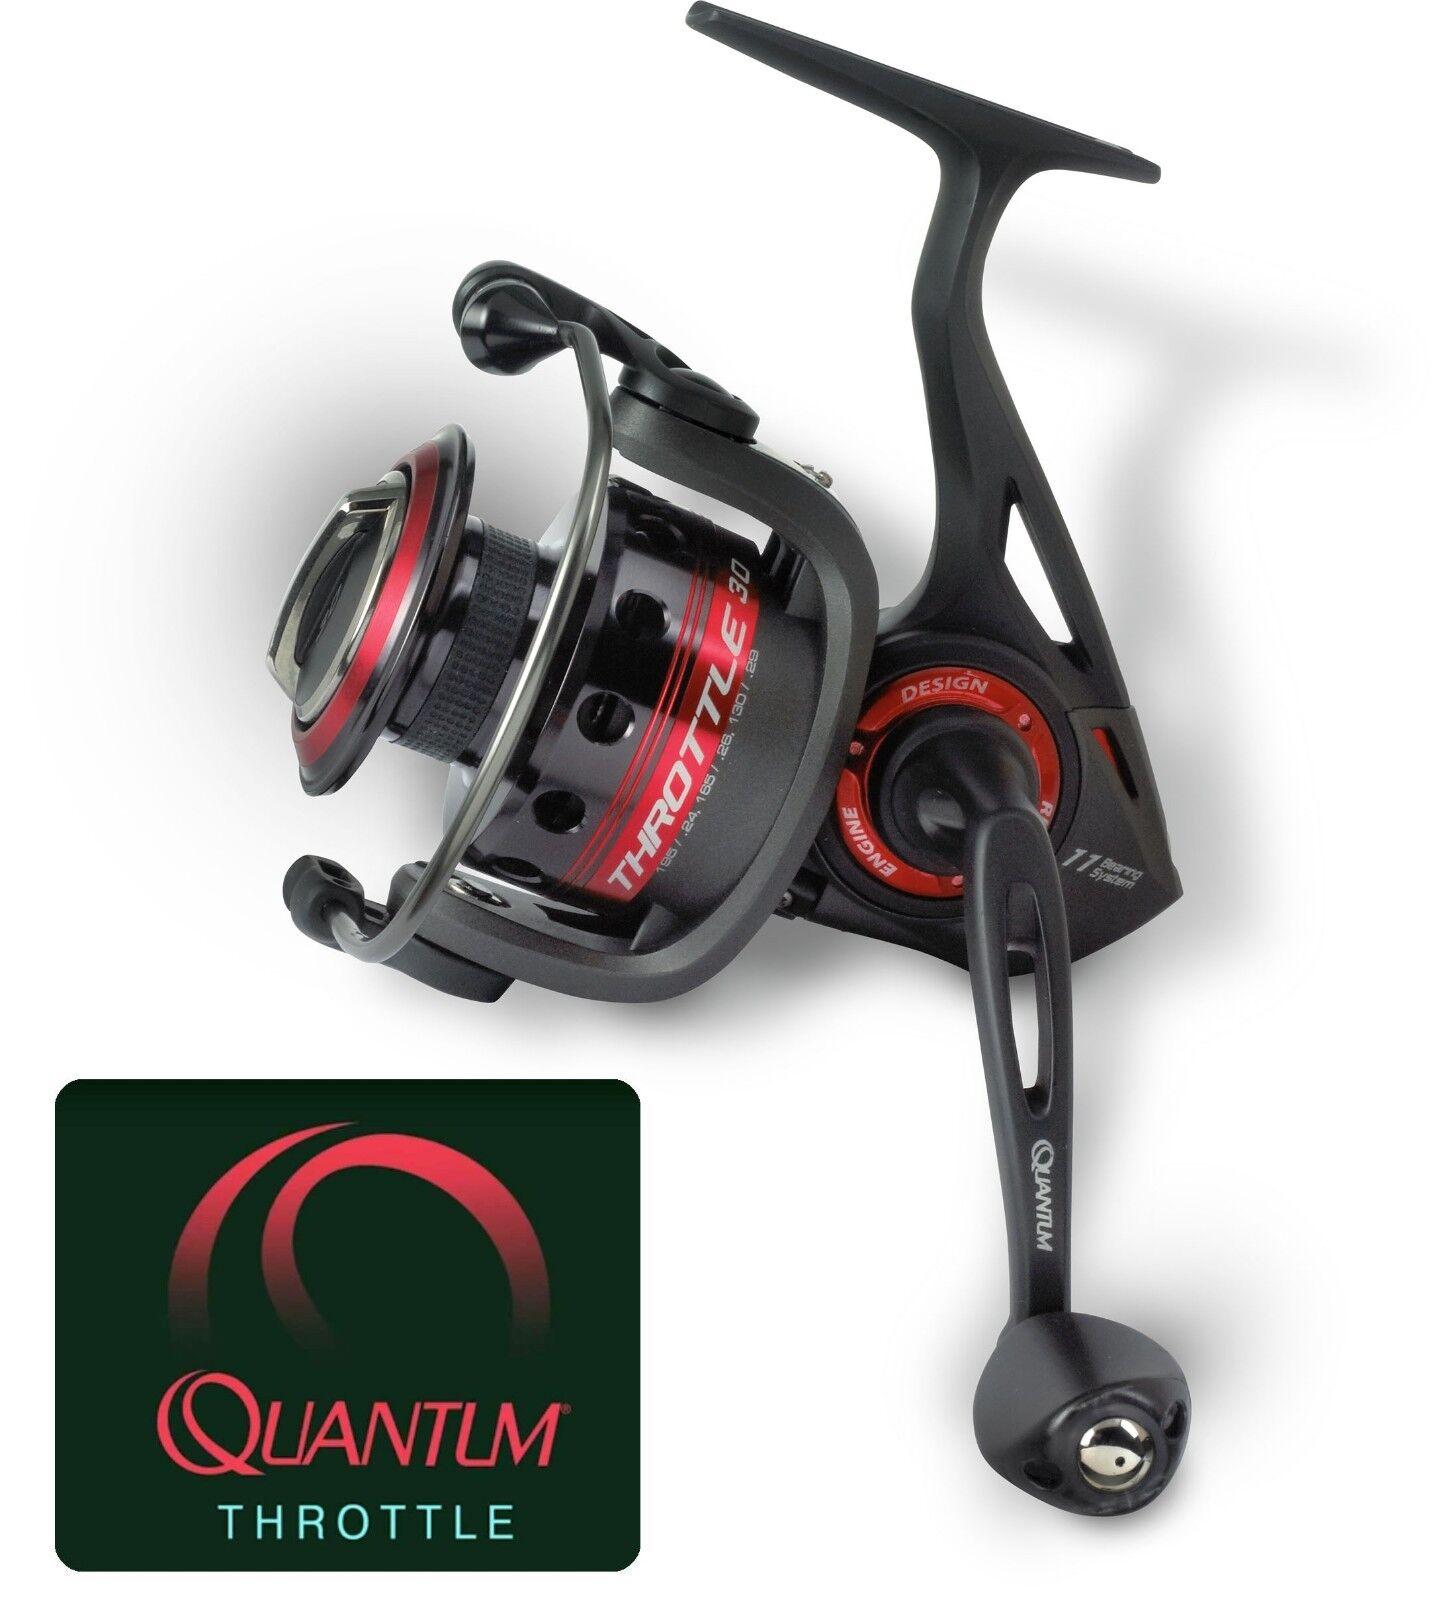 Quantum THROTTLE TH50 + 8 300m Spiderwire® Stealth Smooth 8 + 0,17mm 17kg c739ff